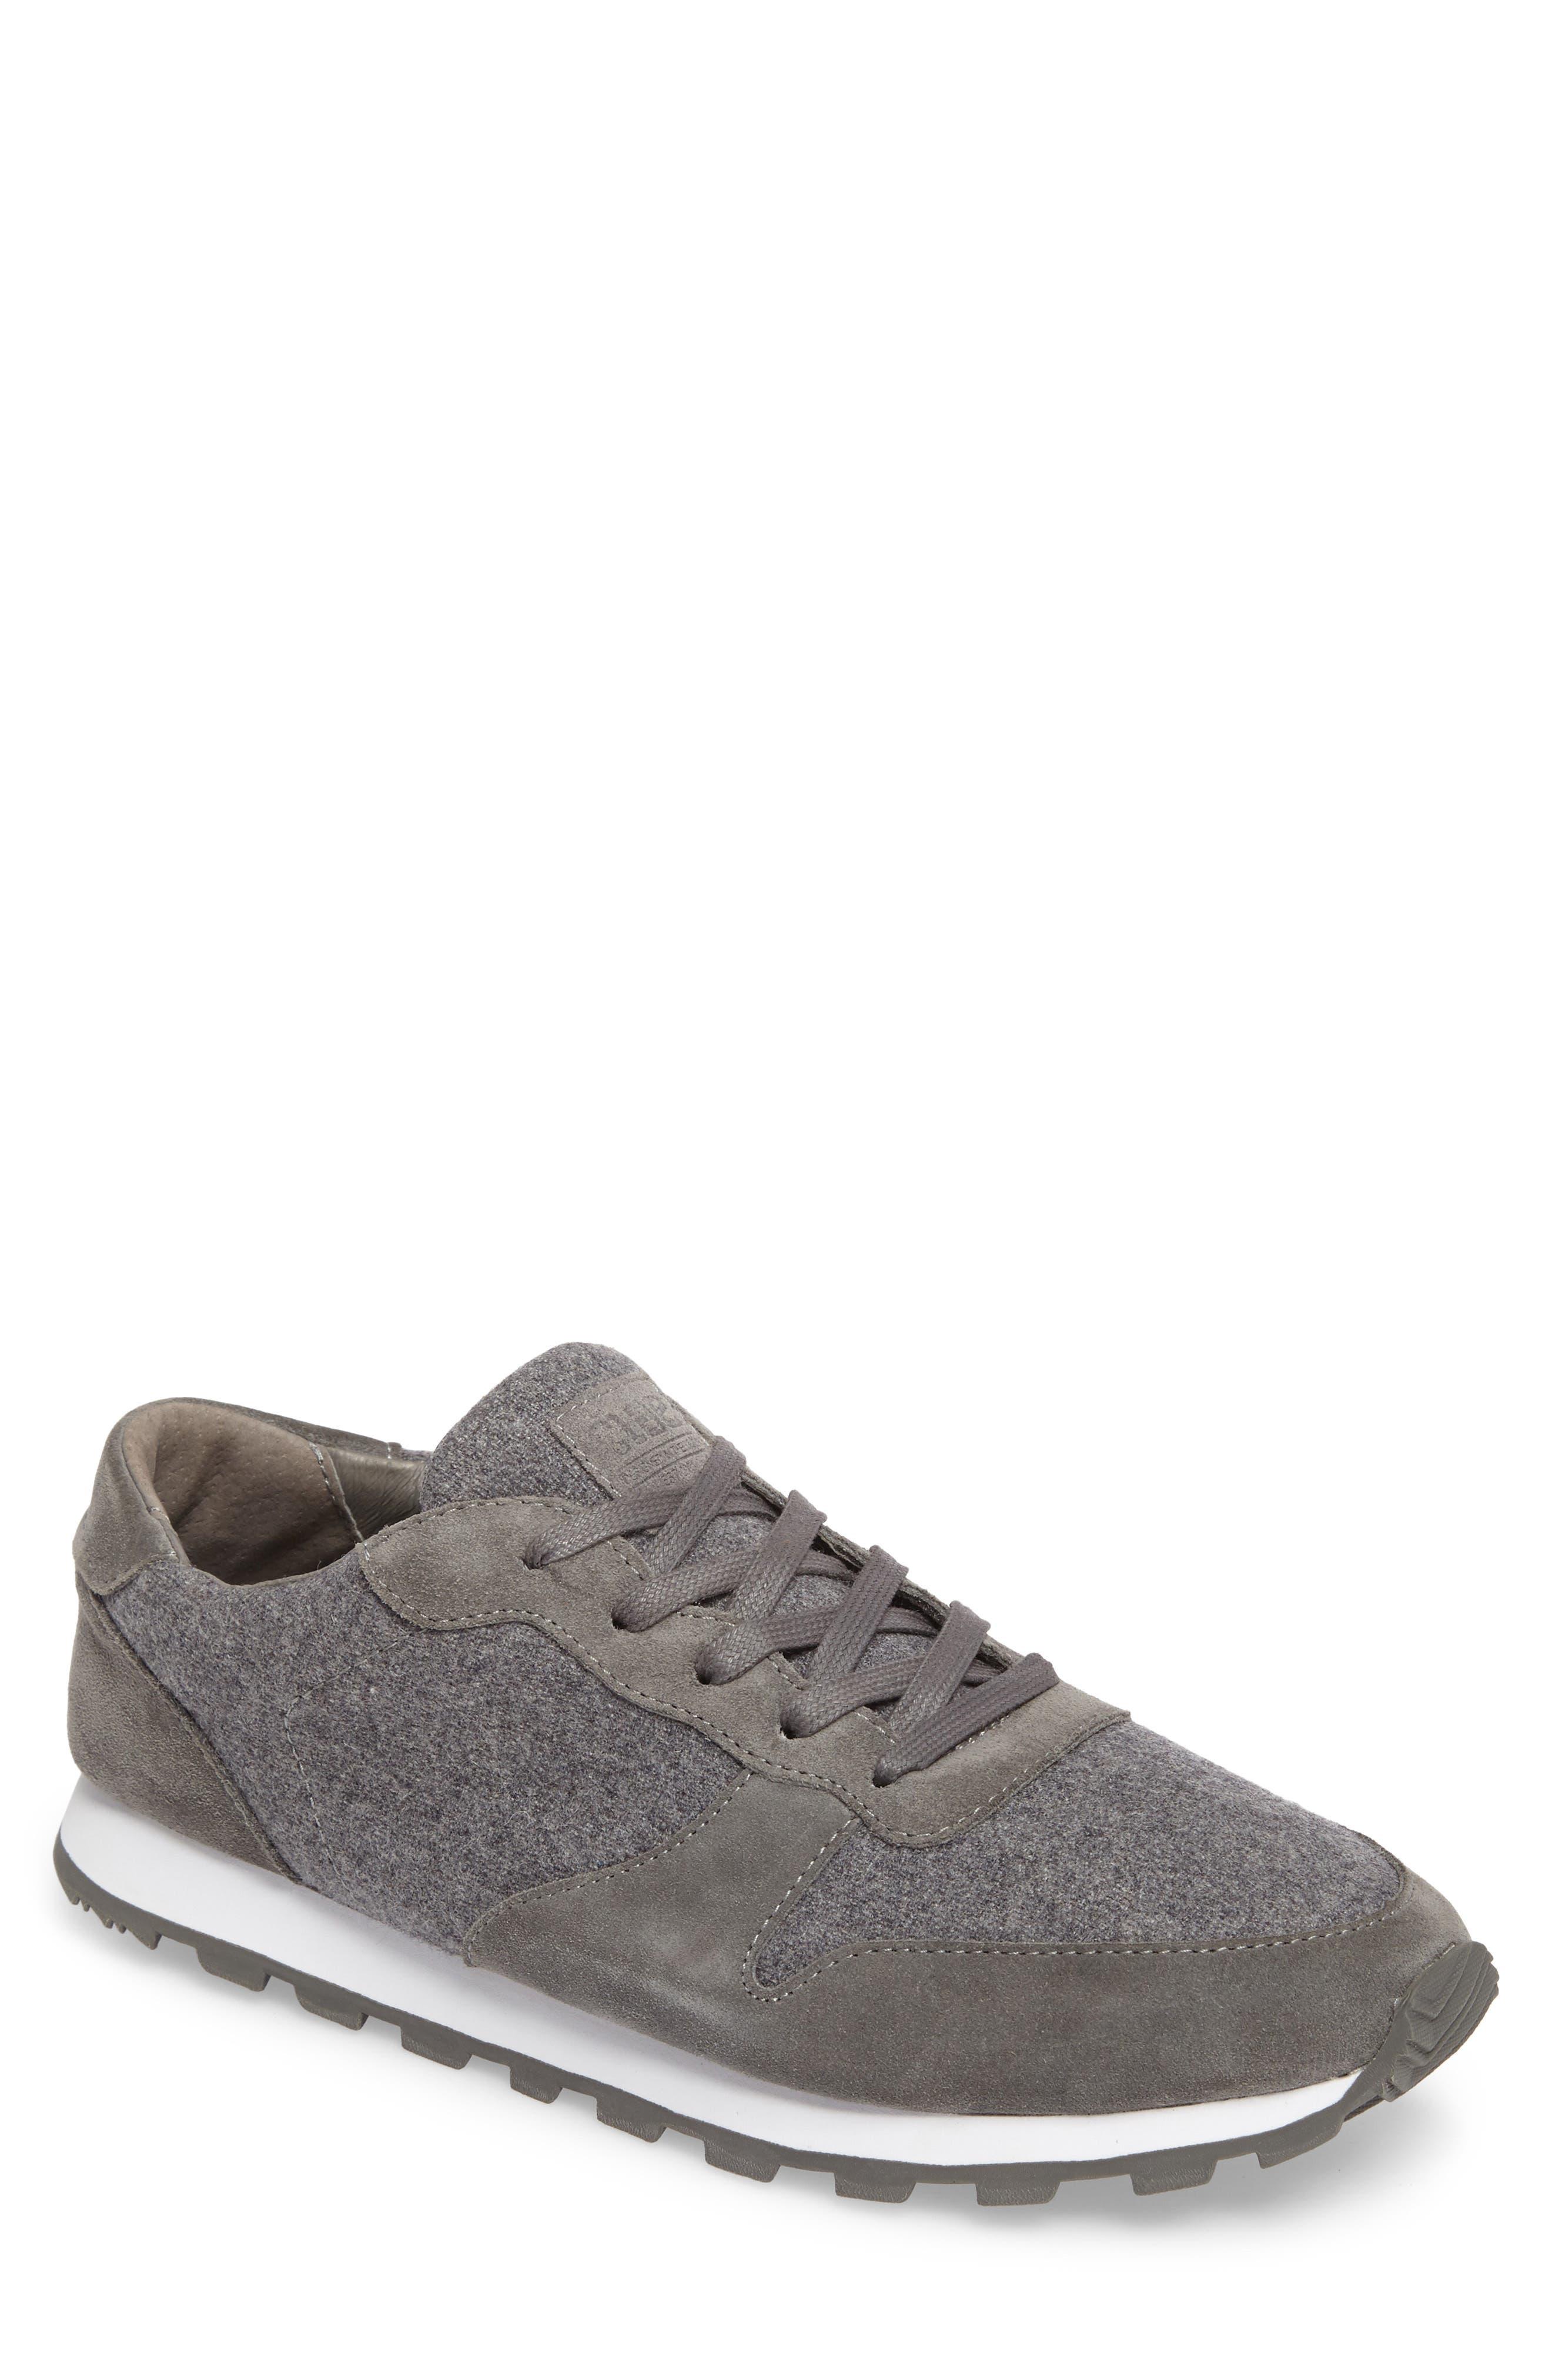 Clae Hayward Sneaker Men